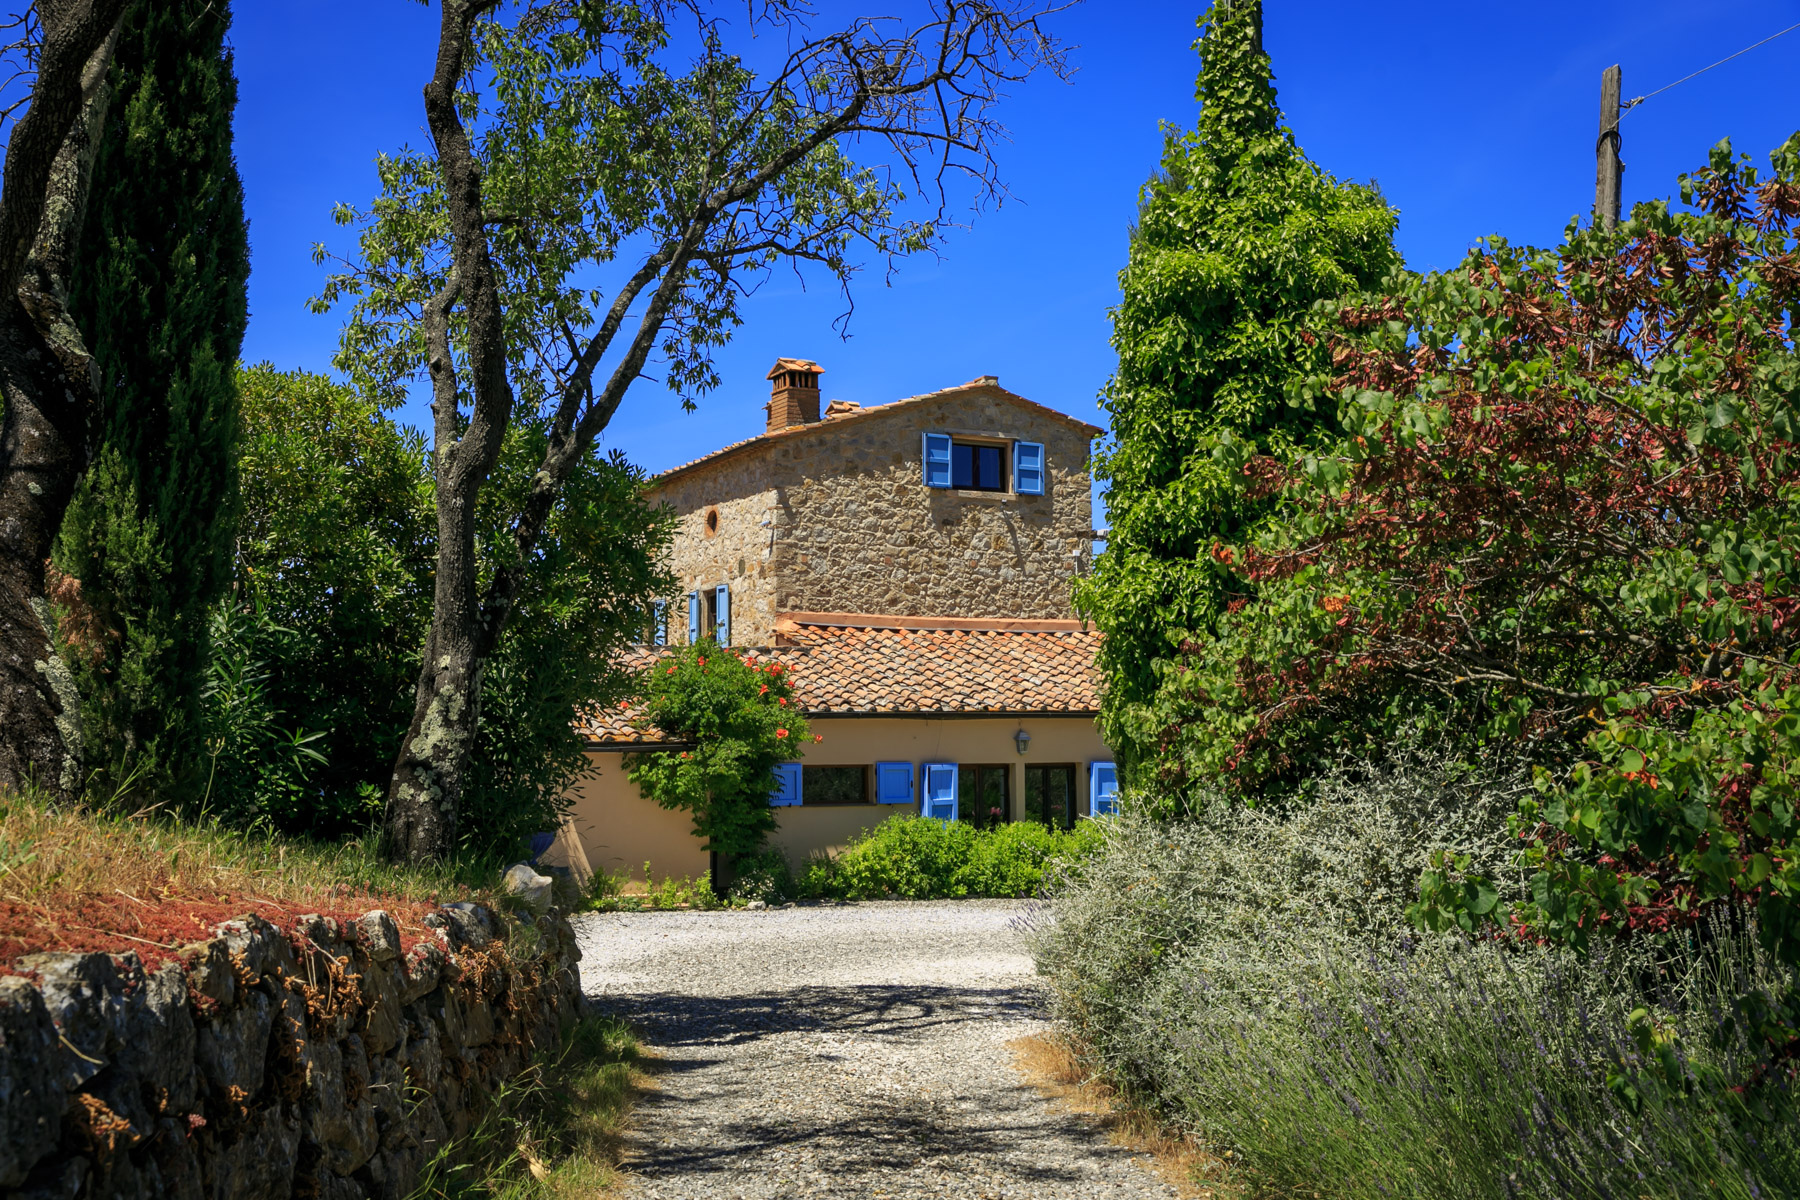 Villa in Vendita a Santa Luce: 5 locali, 270 mq - Foto 28